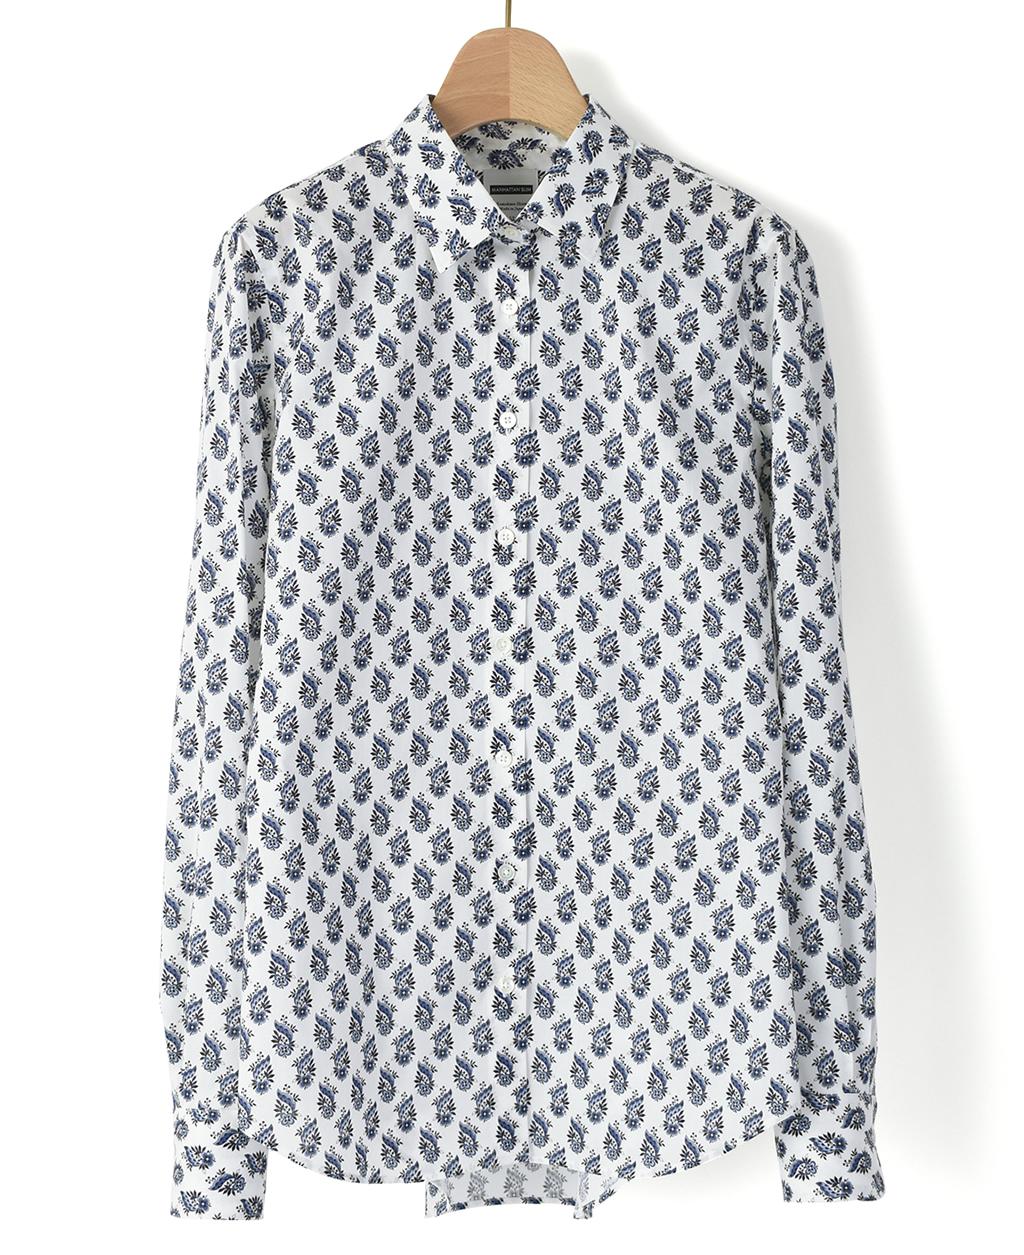 5f73dd368b8222 マンハッタンスリムシャツ(36サイズ / 7号 白): レディース | メーカーズ ...